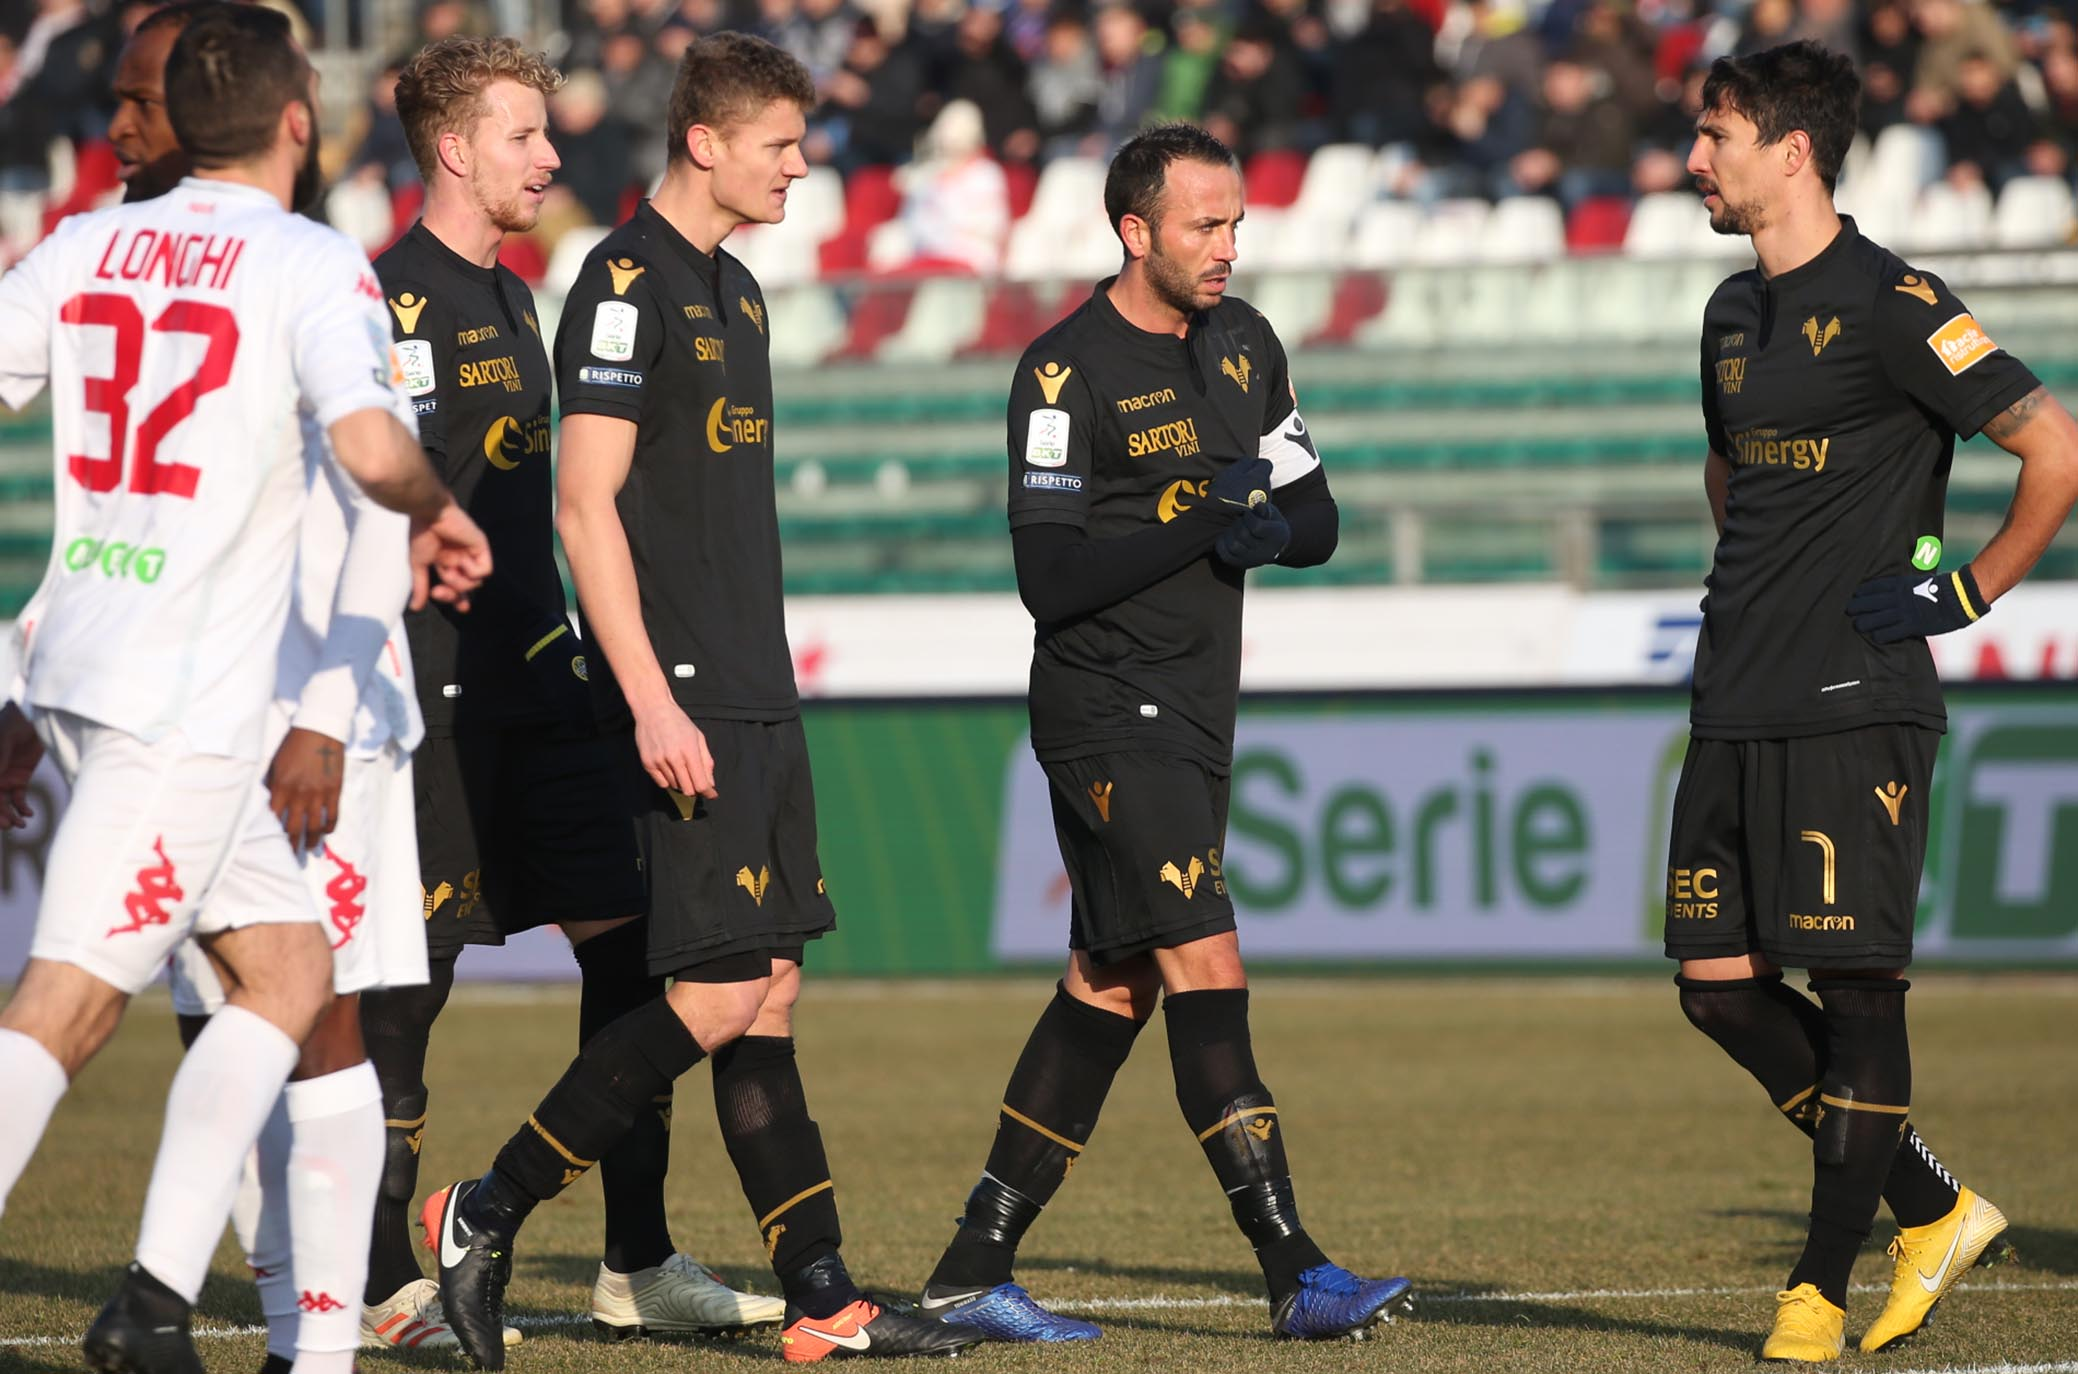 Padova-Hellas Verona, VOTA le PAGELLE DEI TIFOSI - Calcio ...